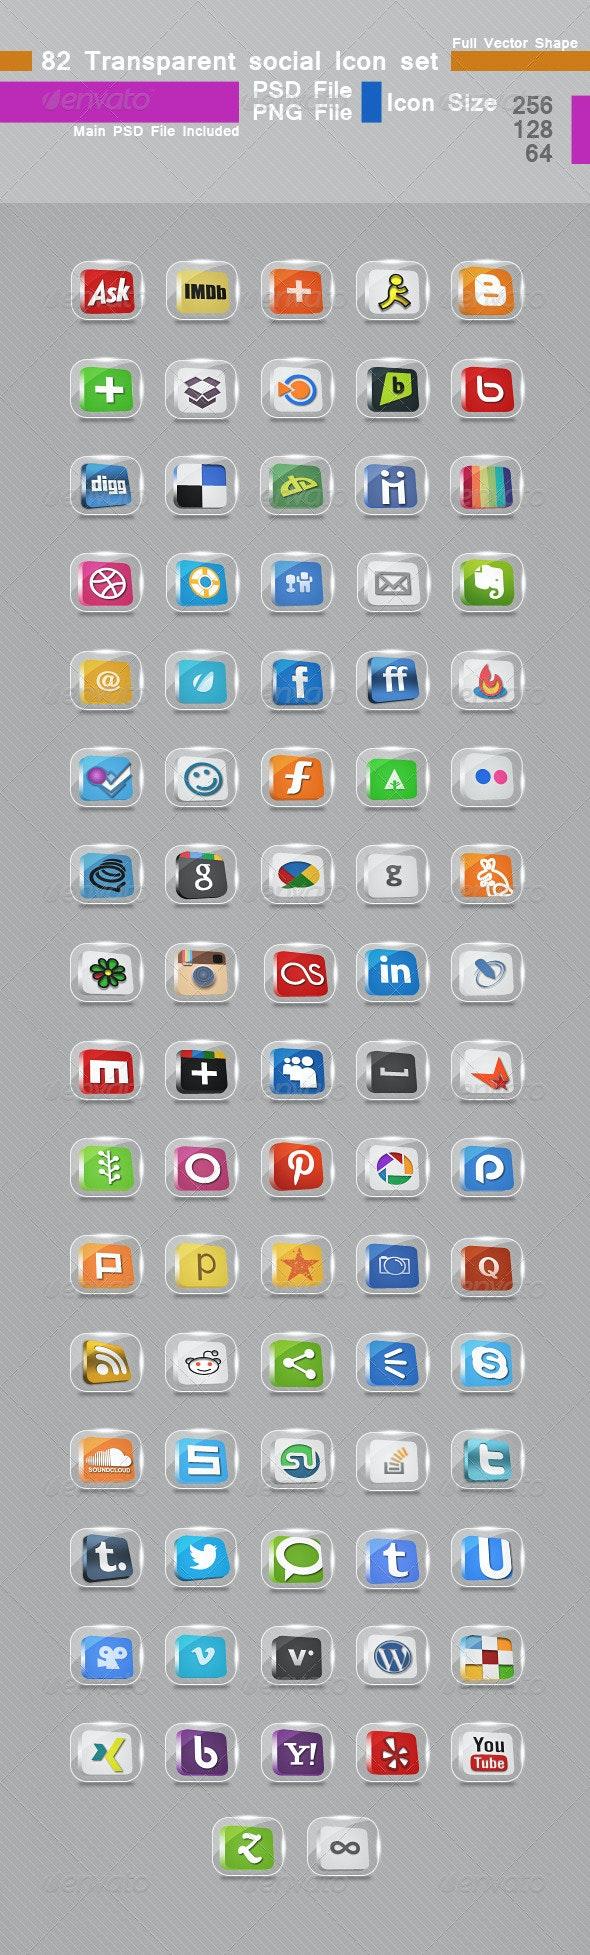 82 Transparent Social Icon set - Media Icons